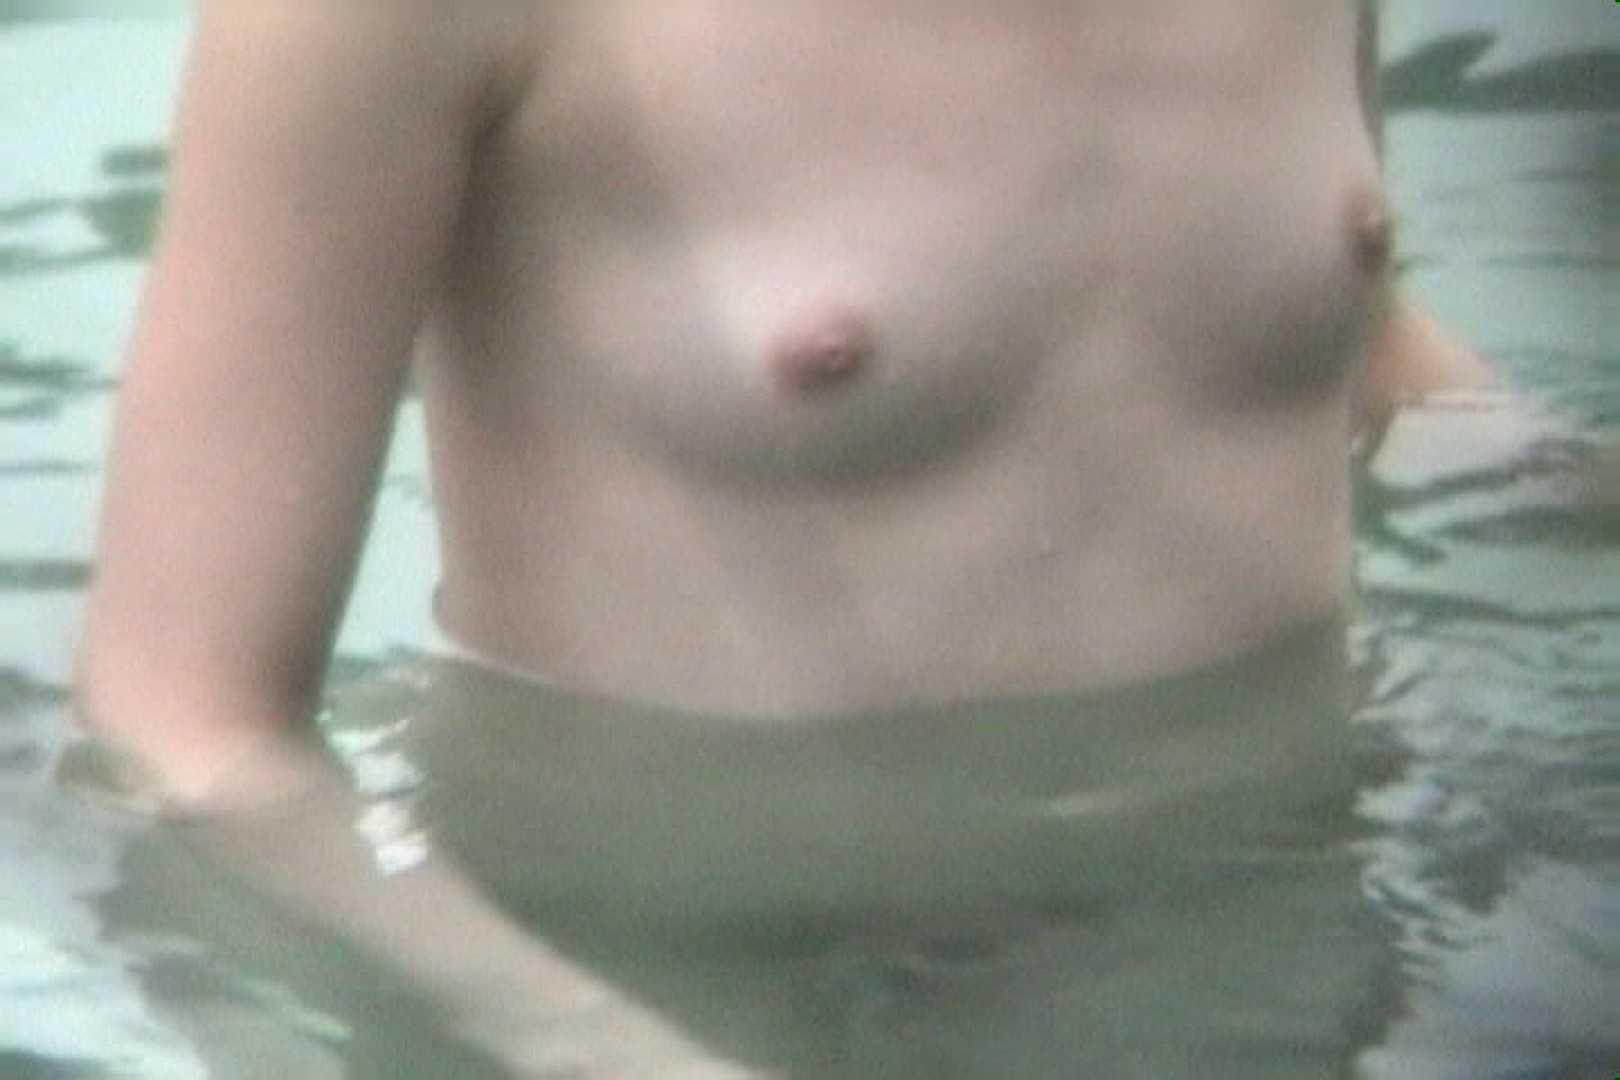 Aquaな露天風呂Vol.71【VIP限定】 OLエロ画像 覗きオメコ動画キャプチャ 68PICs 53